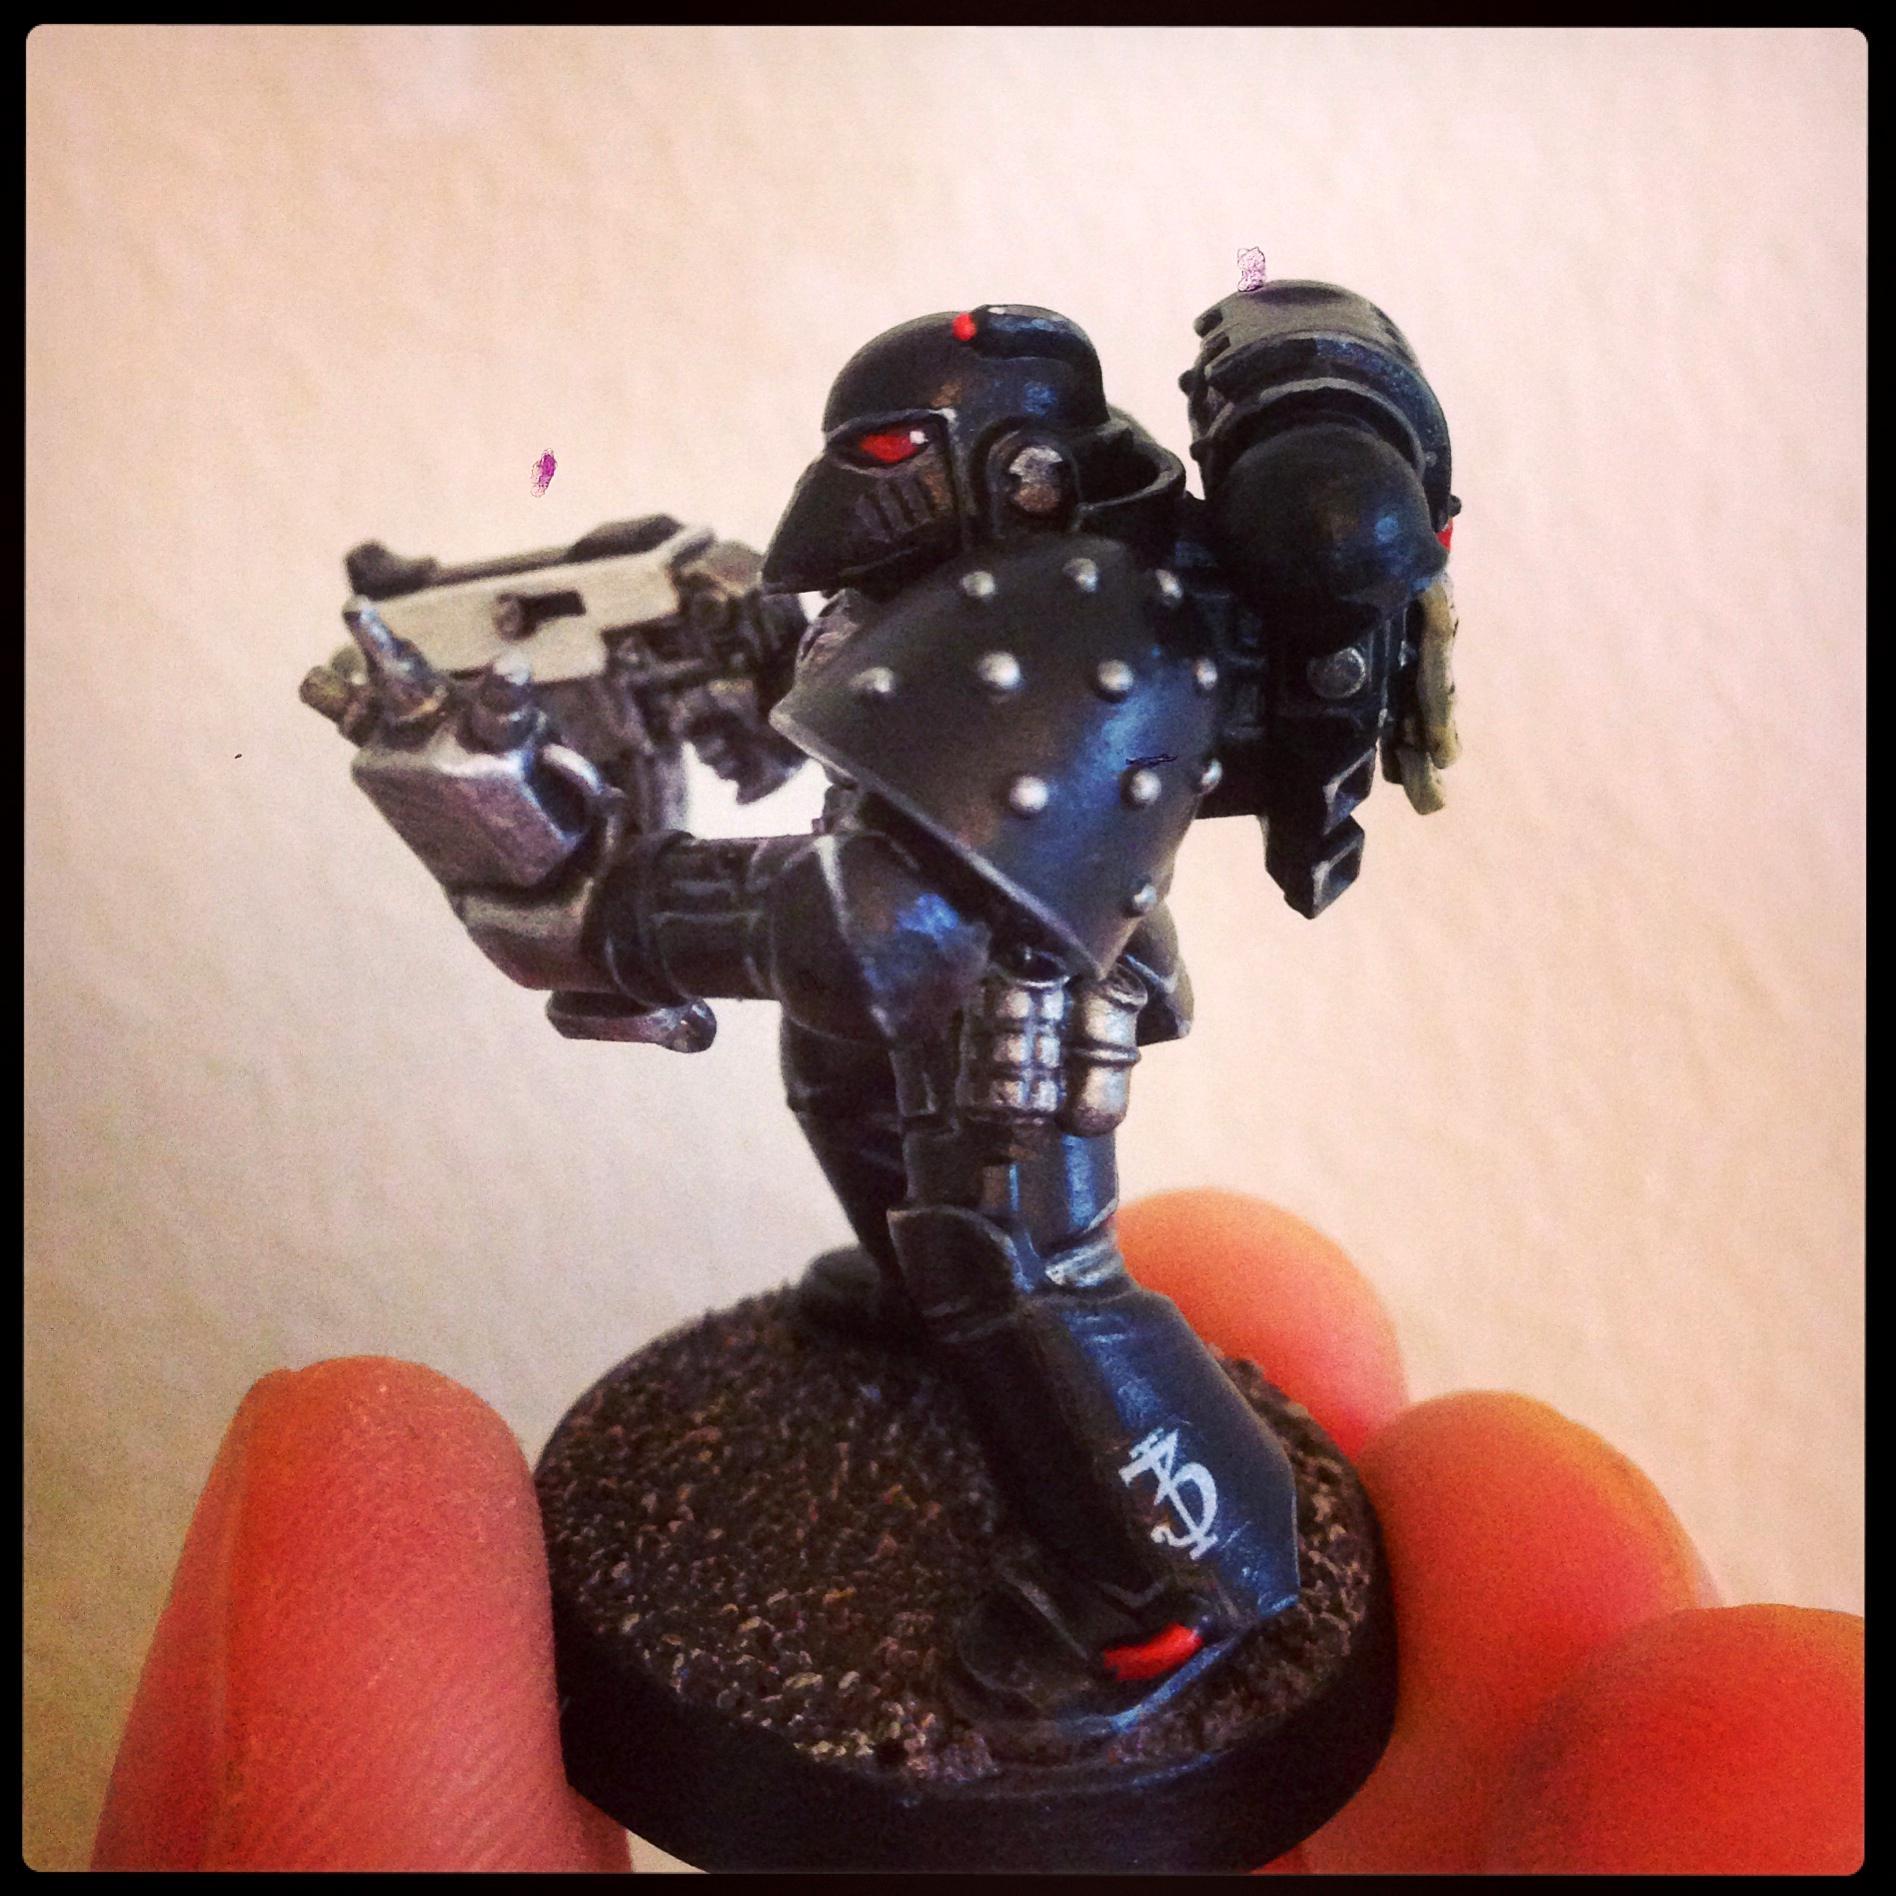 Iron Hands Marine - Side 1